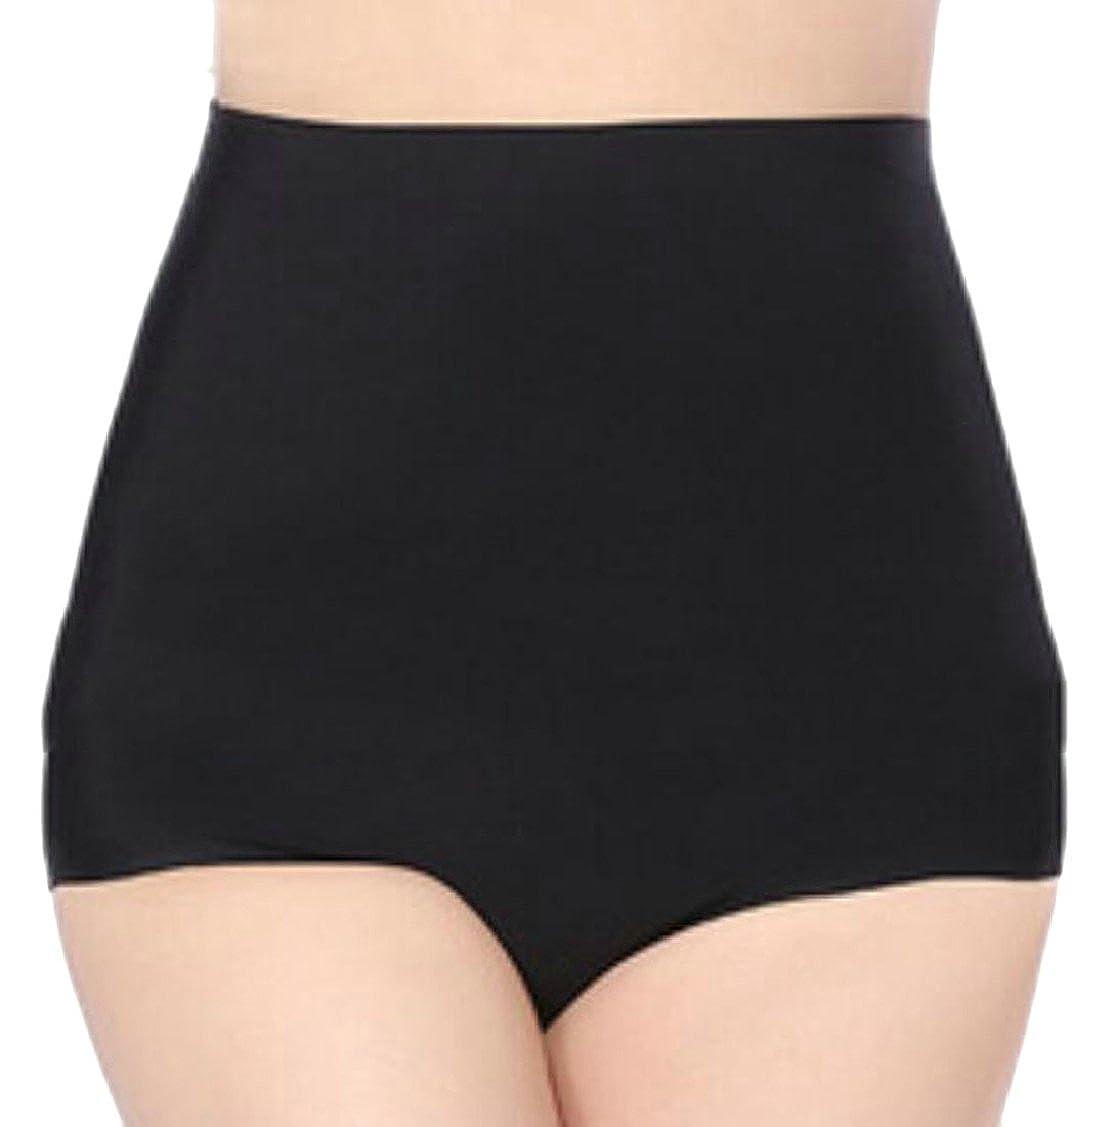 Yayu Women Body Shaper High Waist Tummy Control Butt Lifter Waist Panty Shapewear